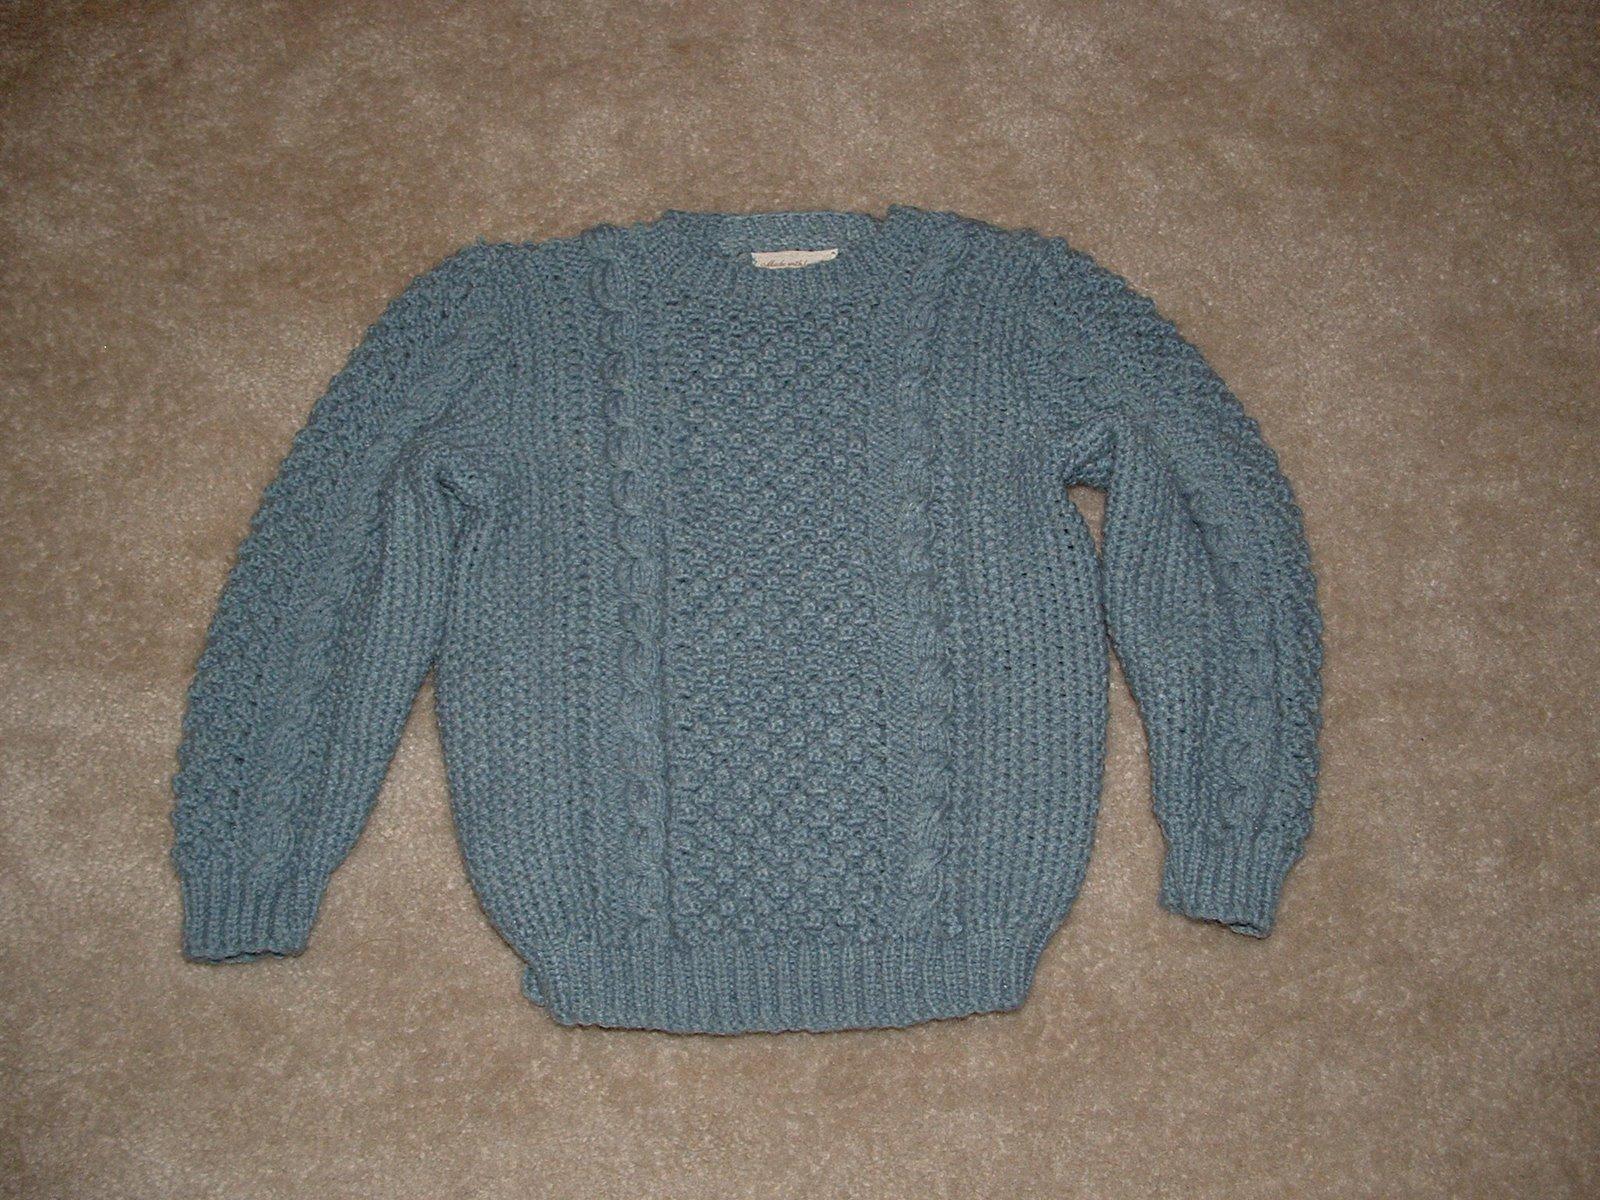 [deidre+sweater+one]